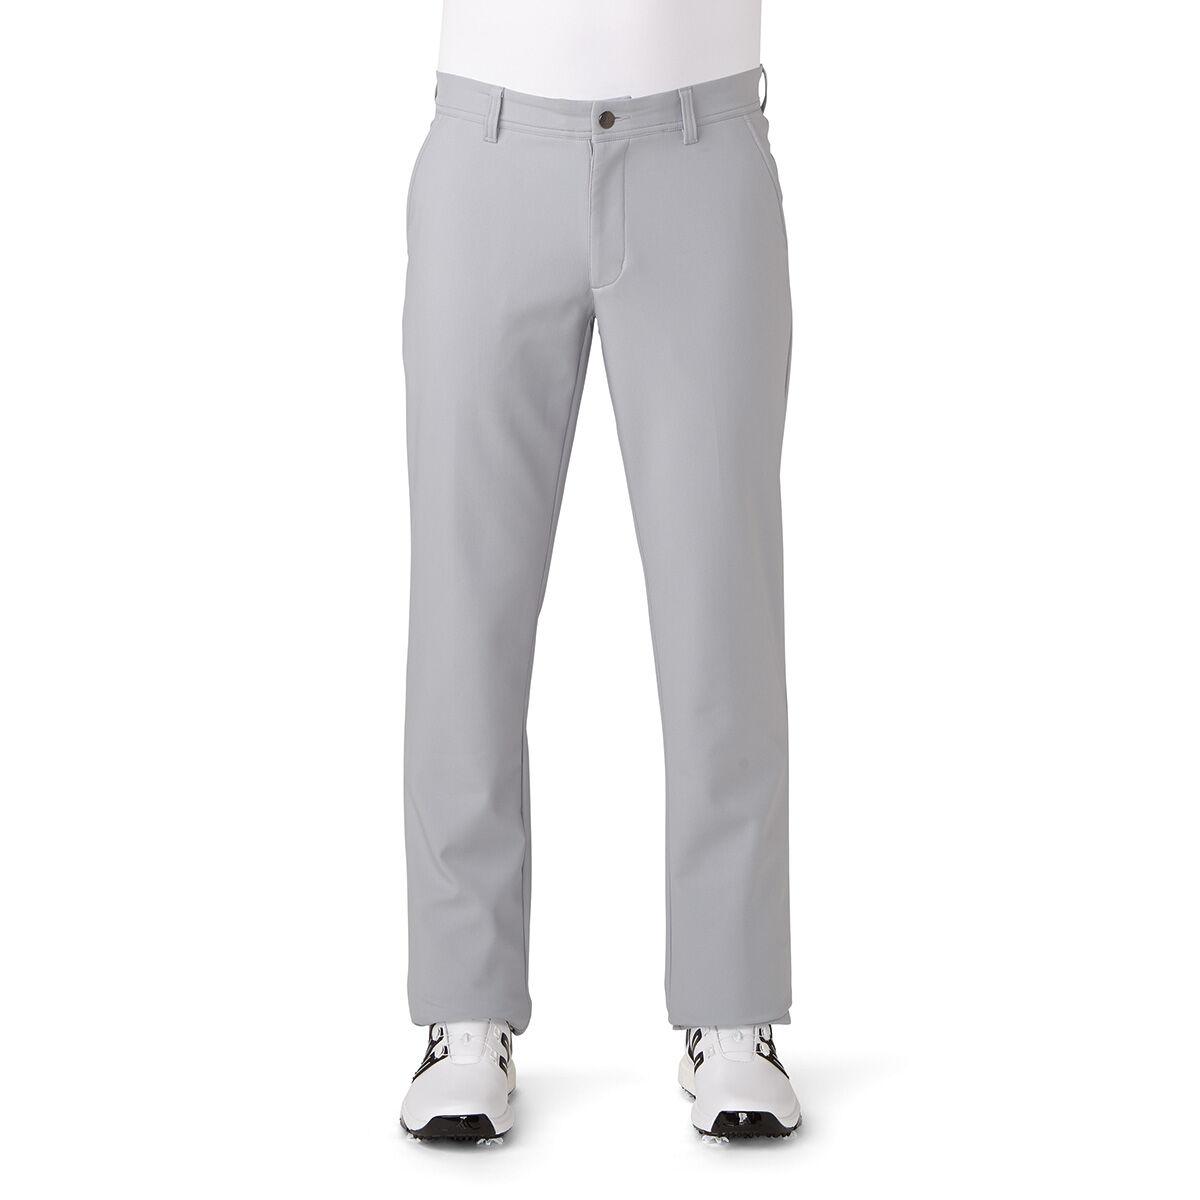 f9006c39122 adidas Ultimate climawarm Golf Pant | PGA TOUR Superstore